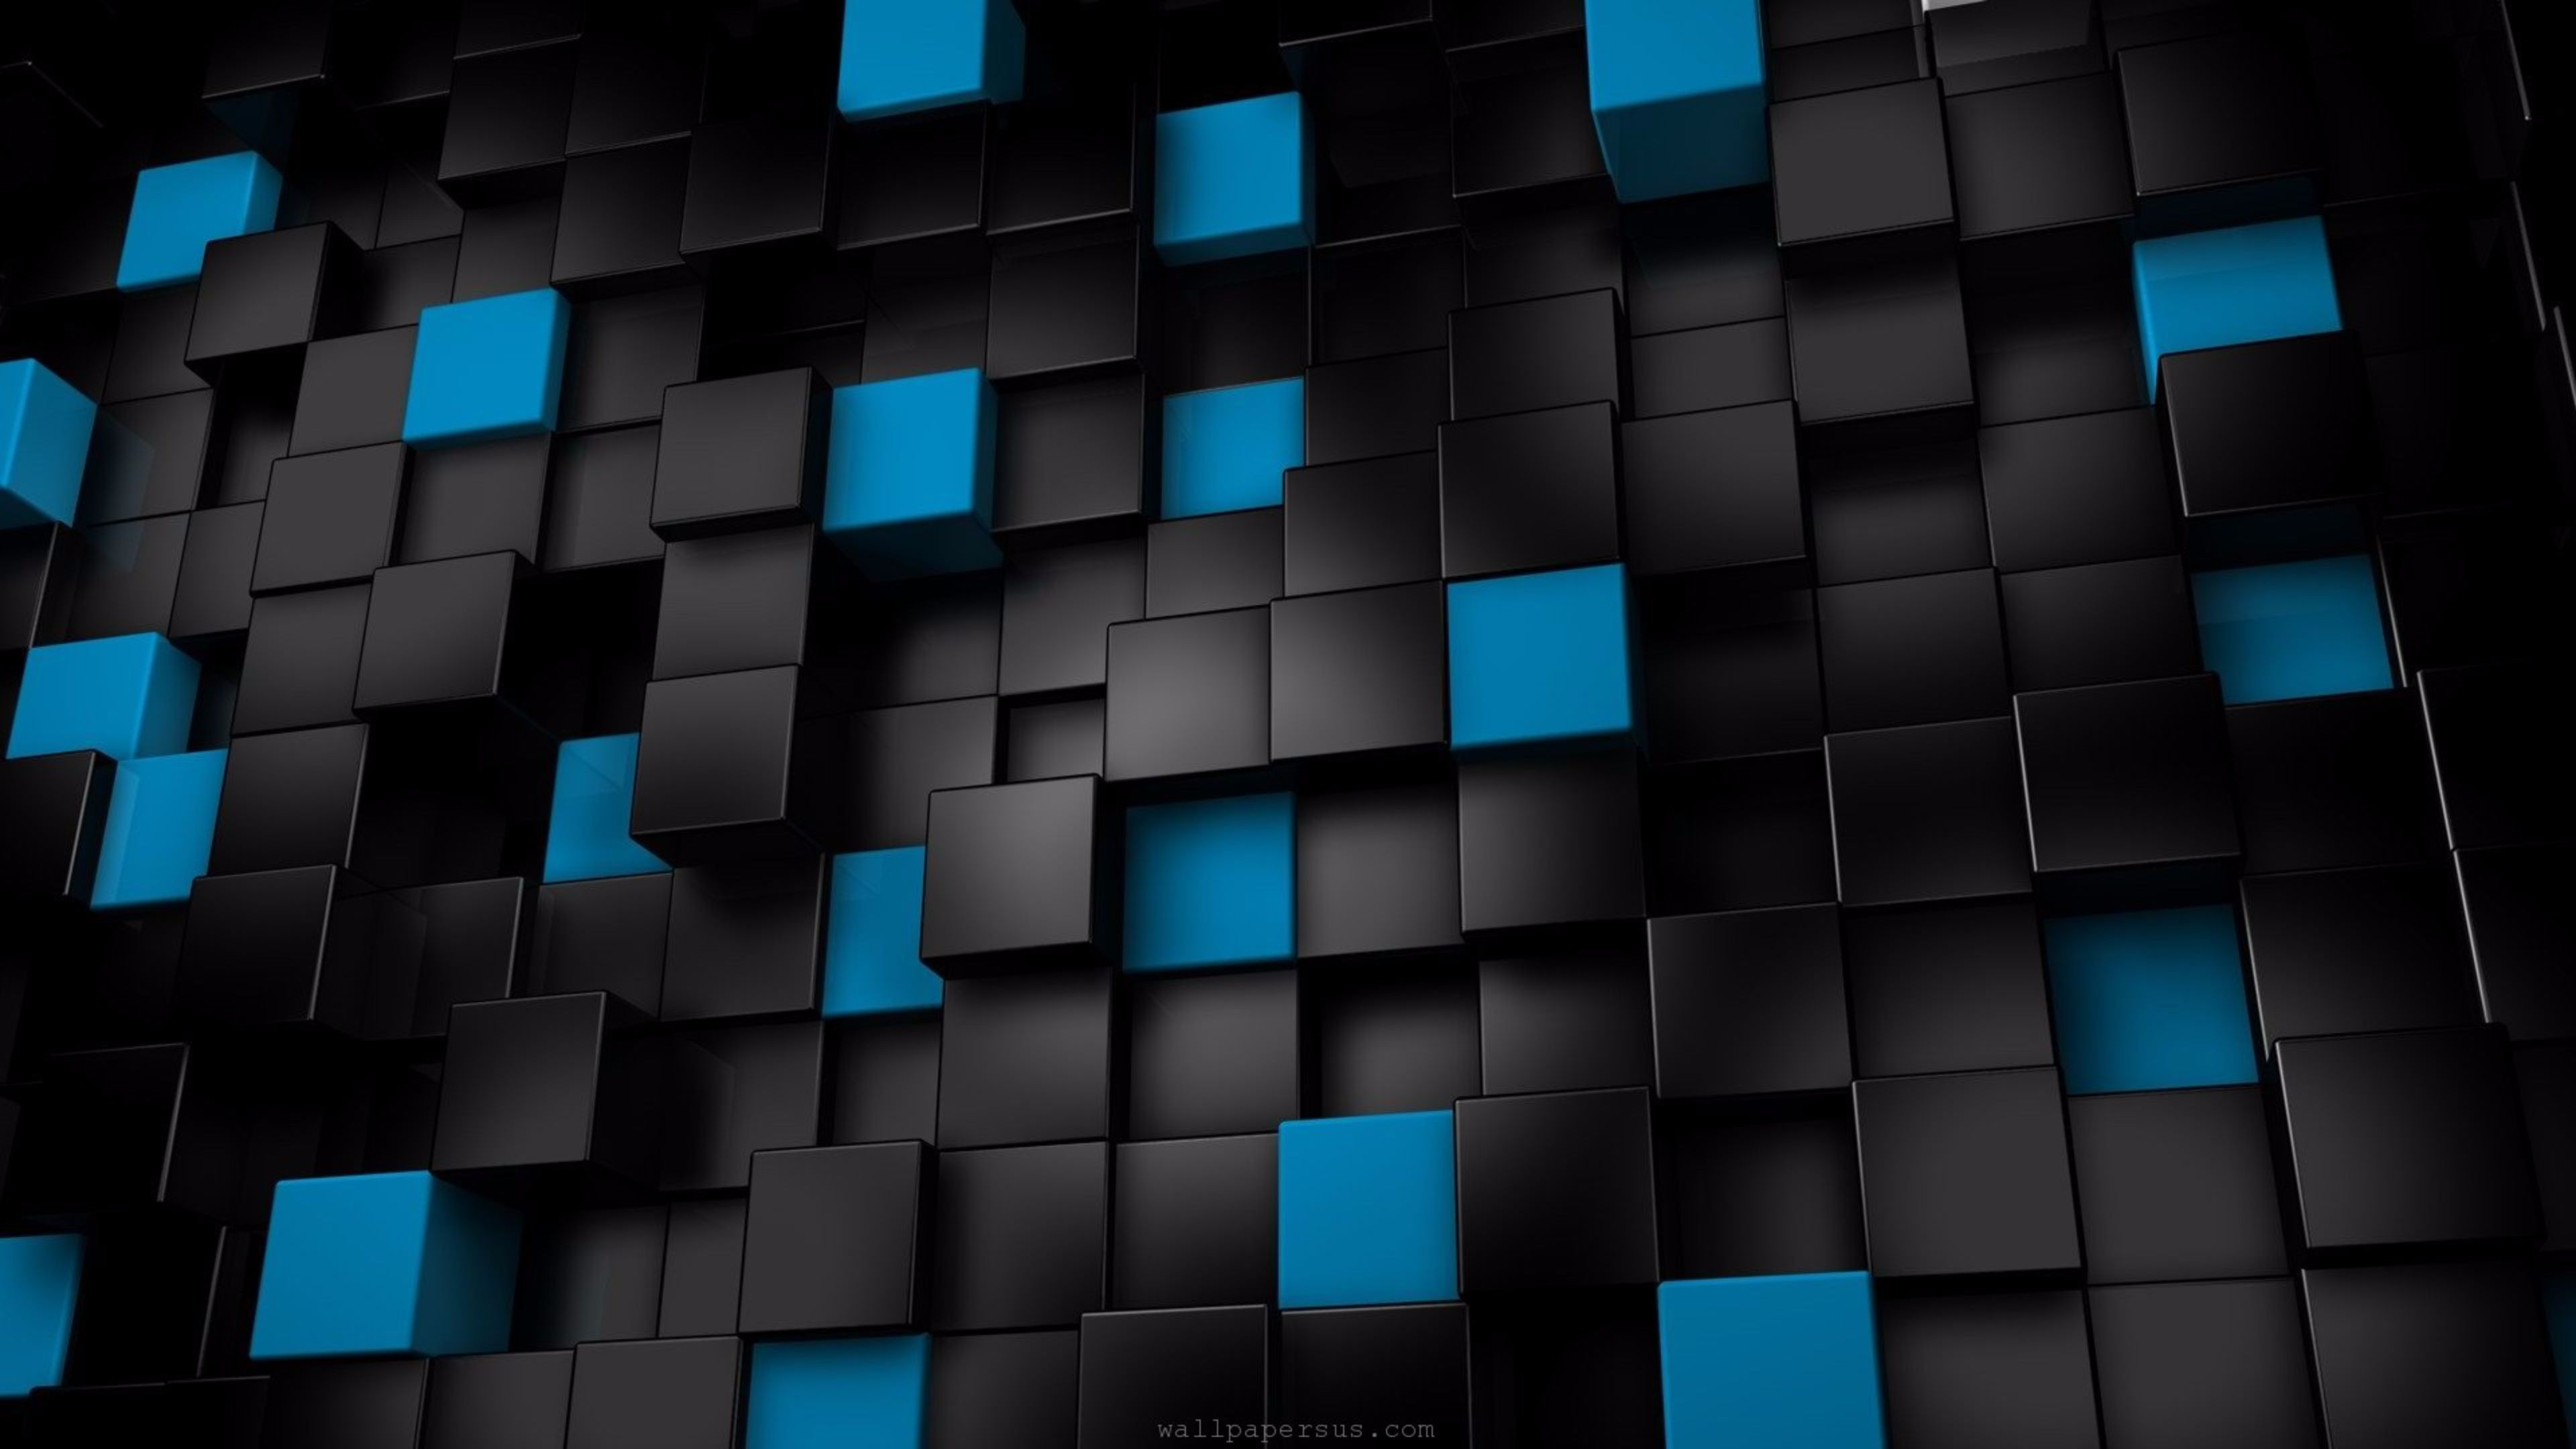 Black And Blue 3d 4k 壁紙 アルファベット 写真 ファンポップ Page 13